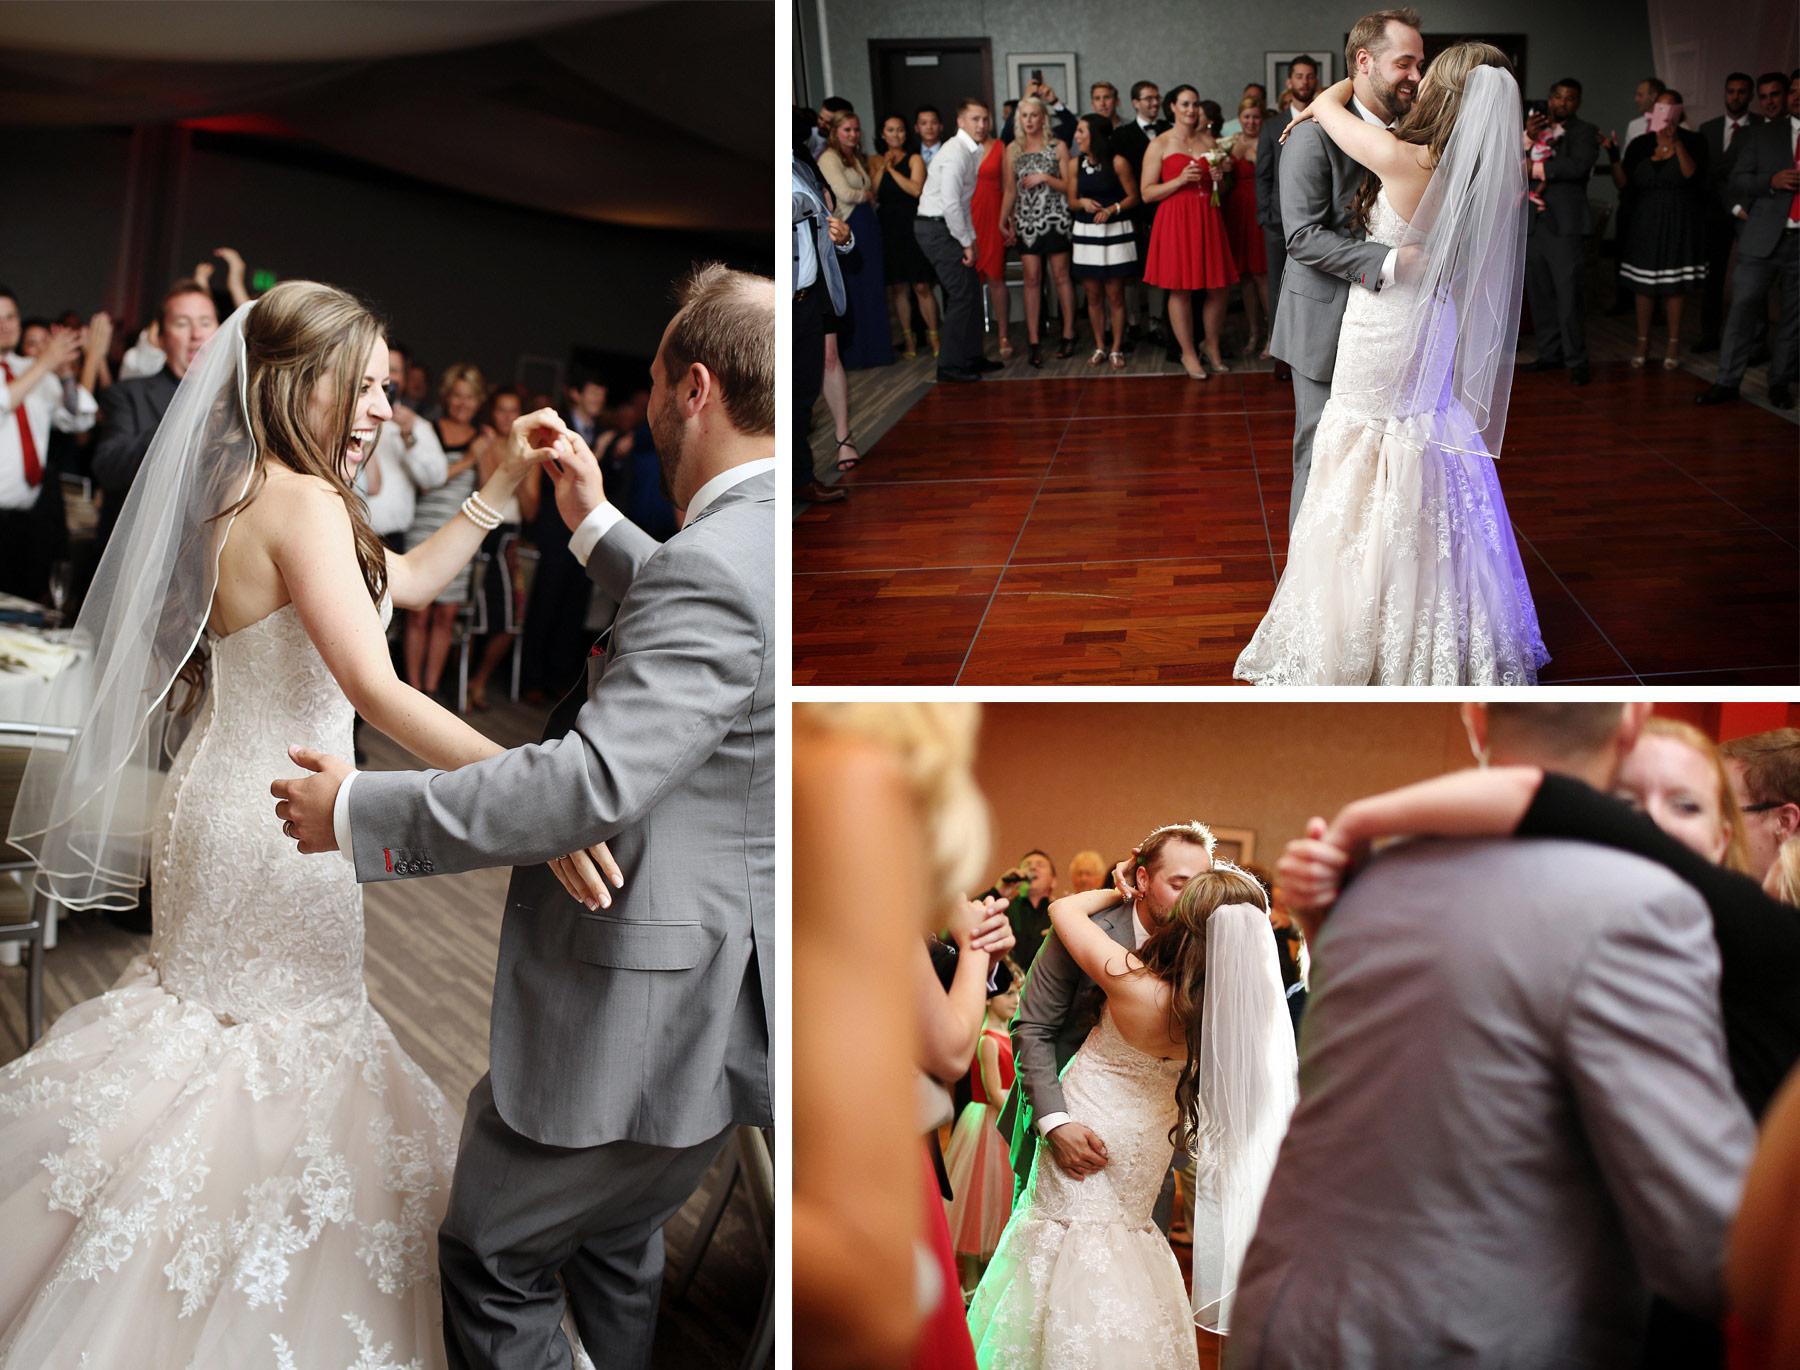 23-Minneapolis-Minnesota-Wedding-Photographer-by-Andrew-Vick-Photography-Summer-Edina-Westin-Hotel-Reception-Dance-Kiss-Embrace-Bride-Groom-Natalie-and-Andrew.jpg